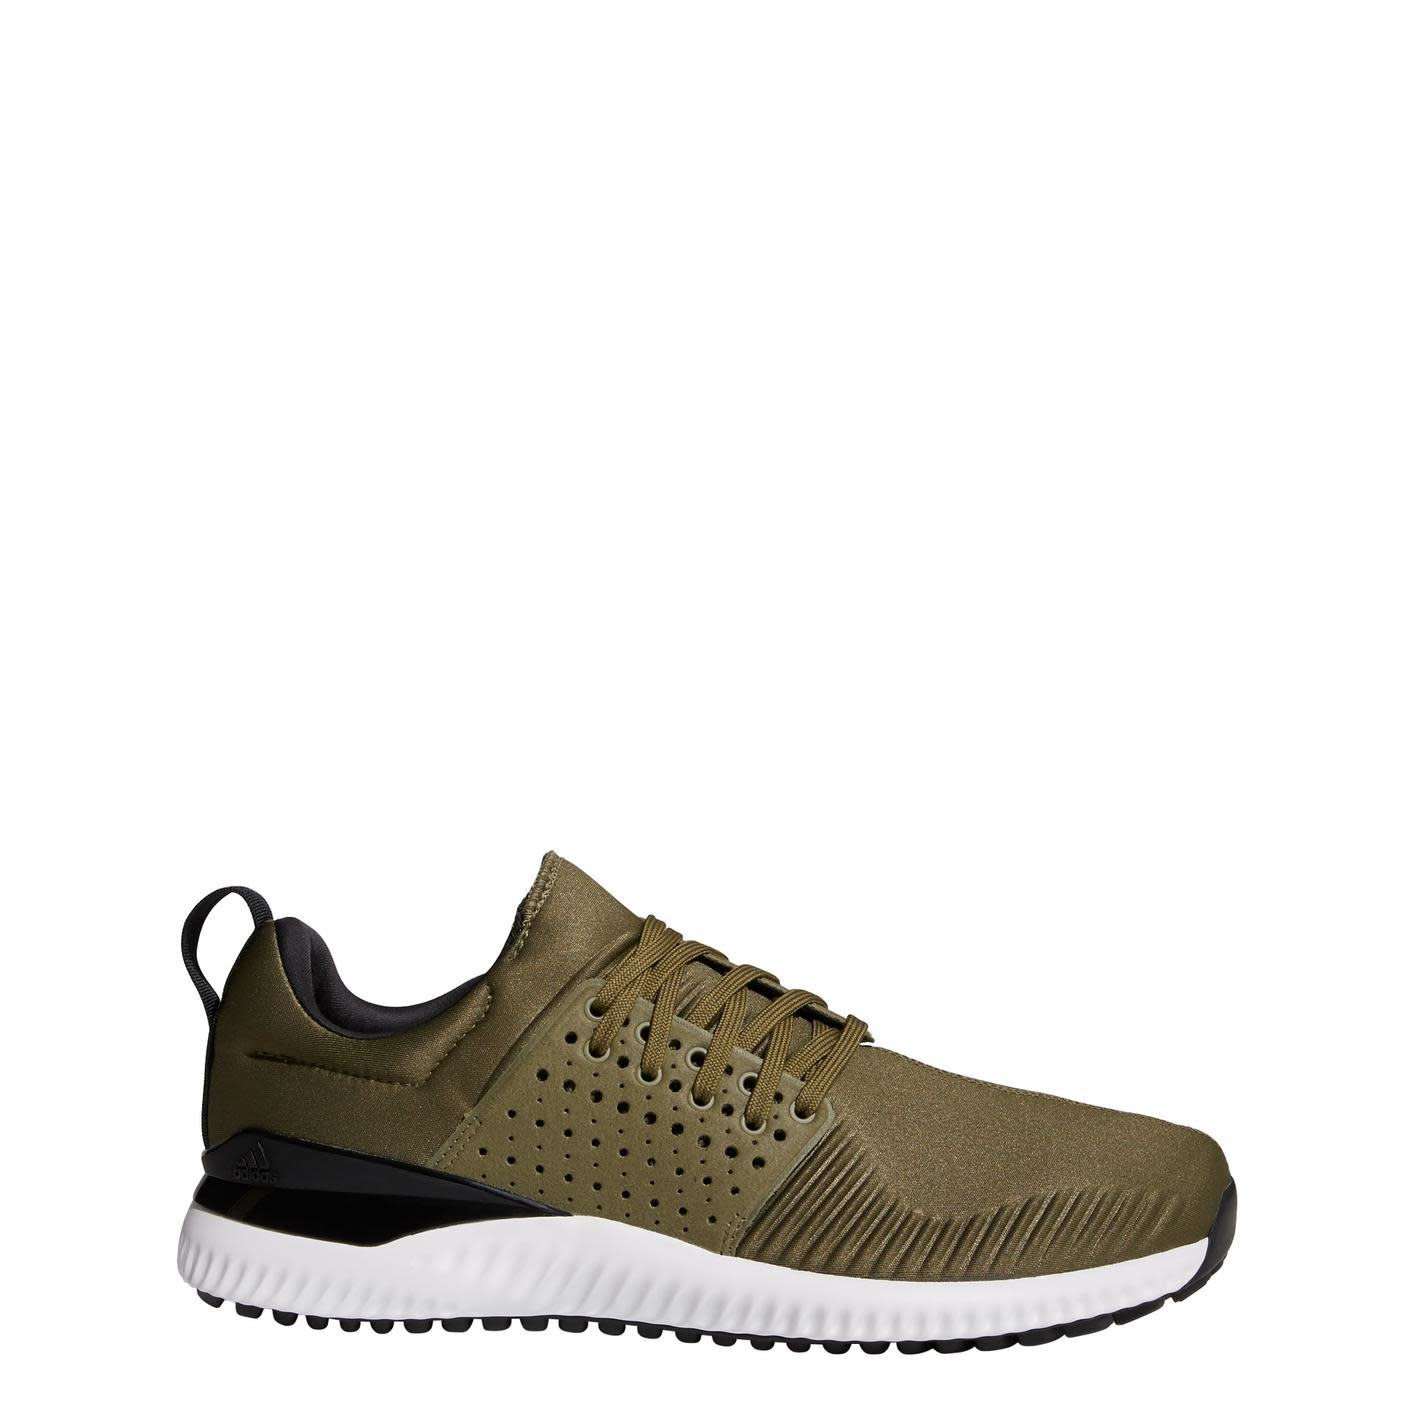 Adidas Adicross Bounce Shoes